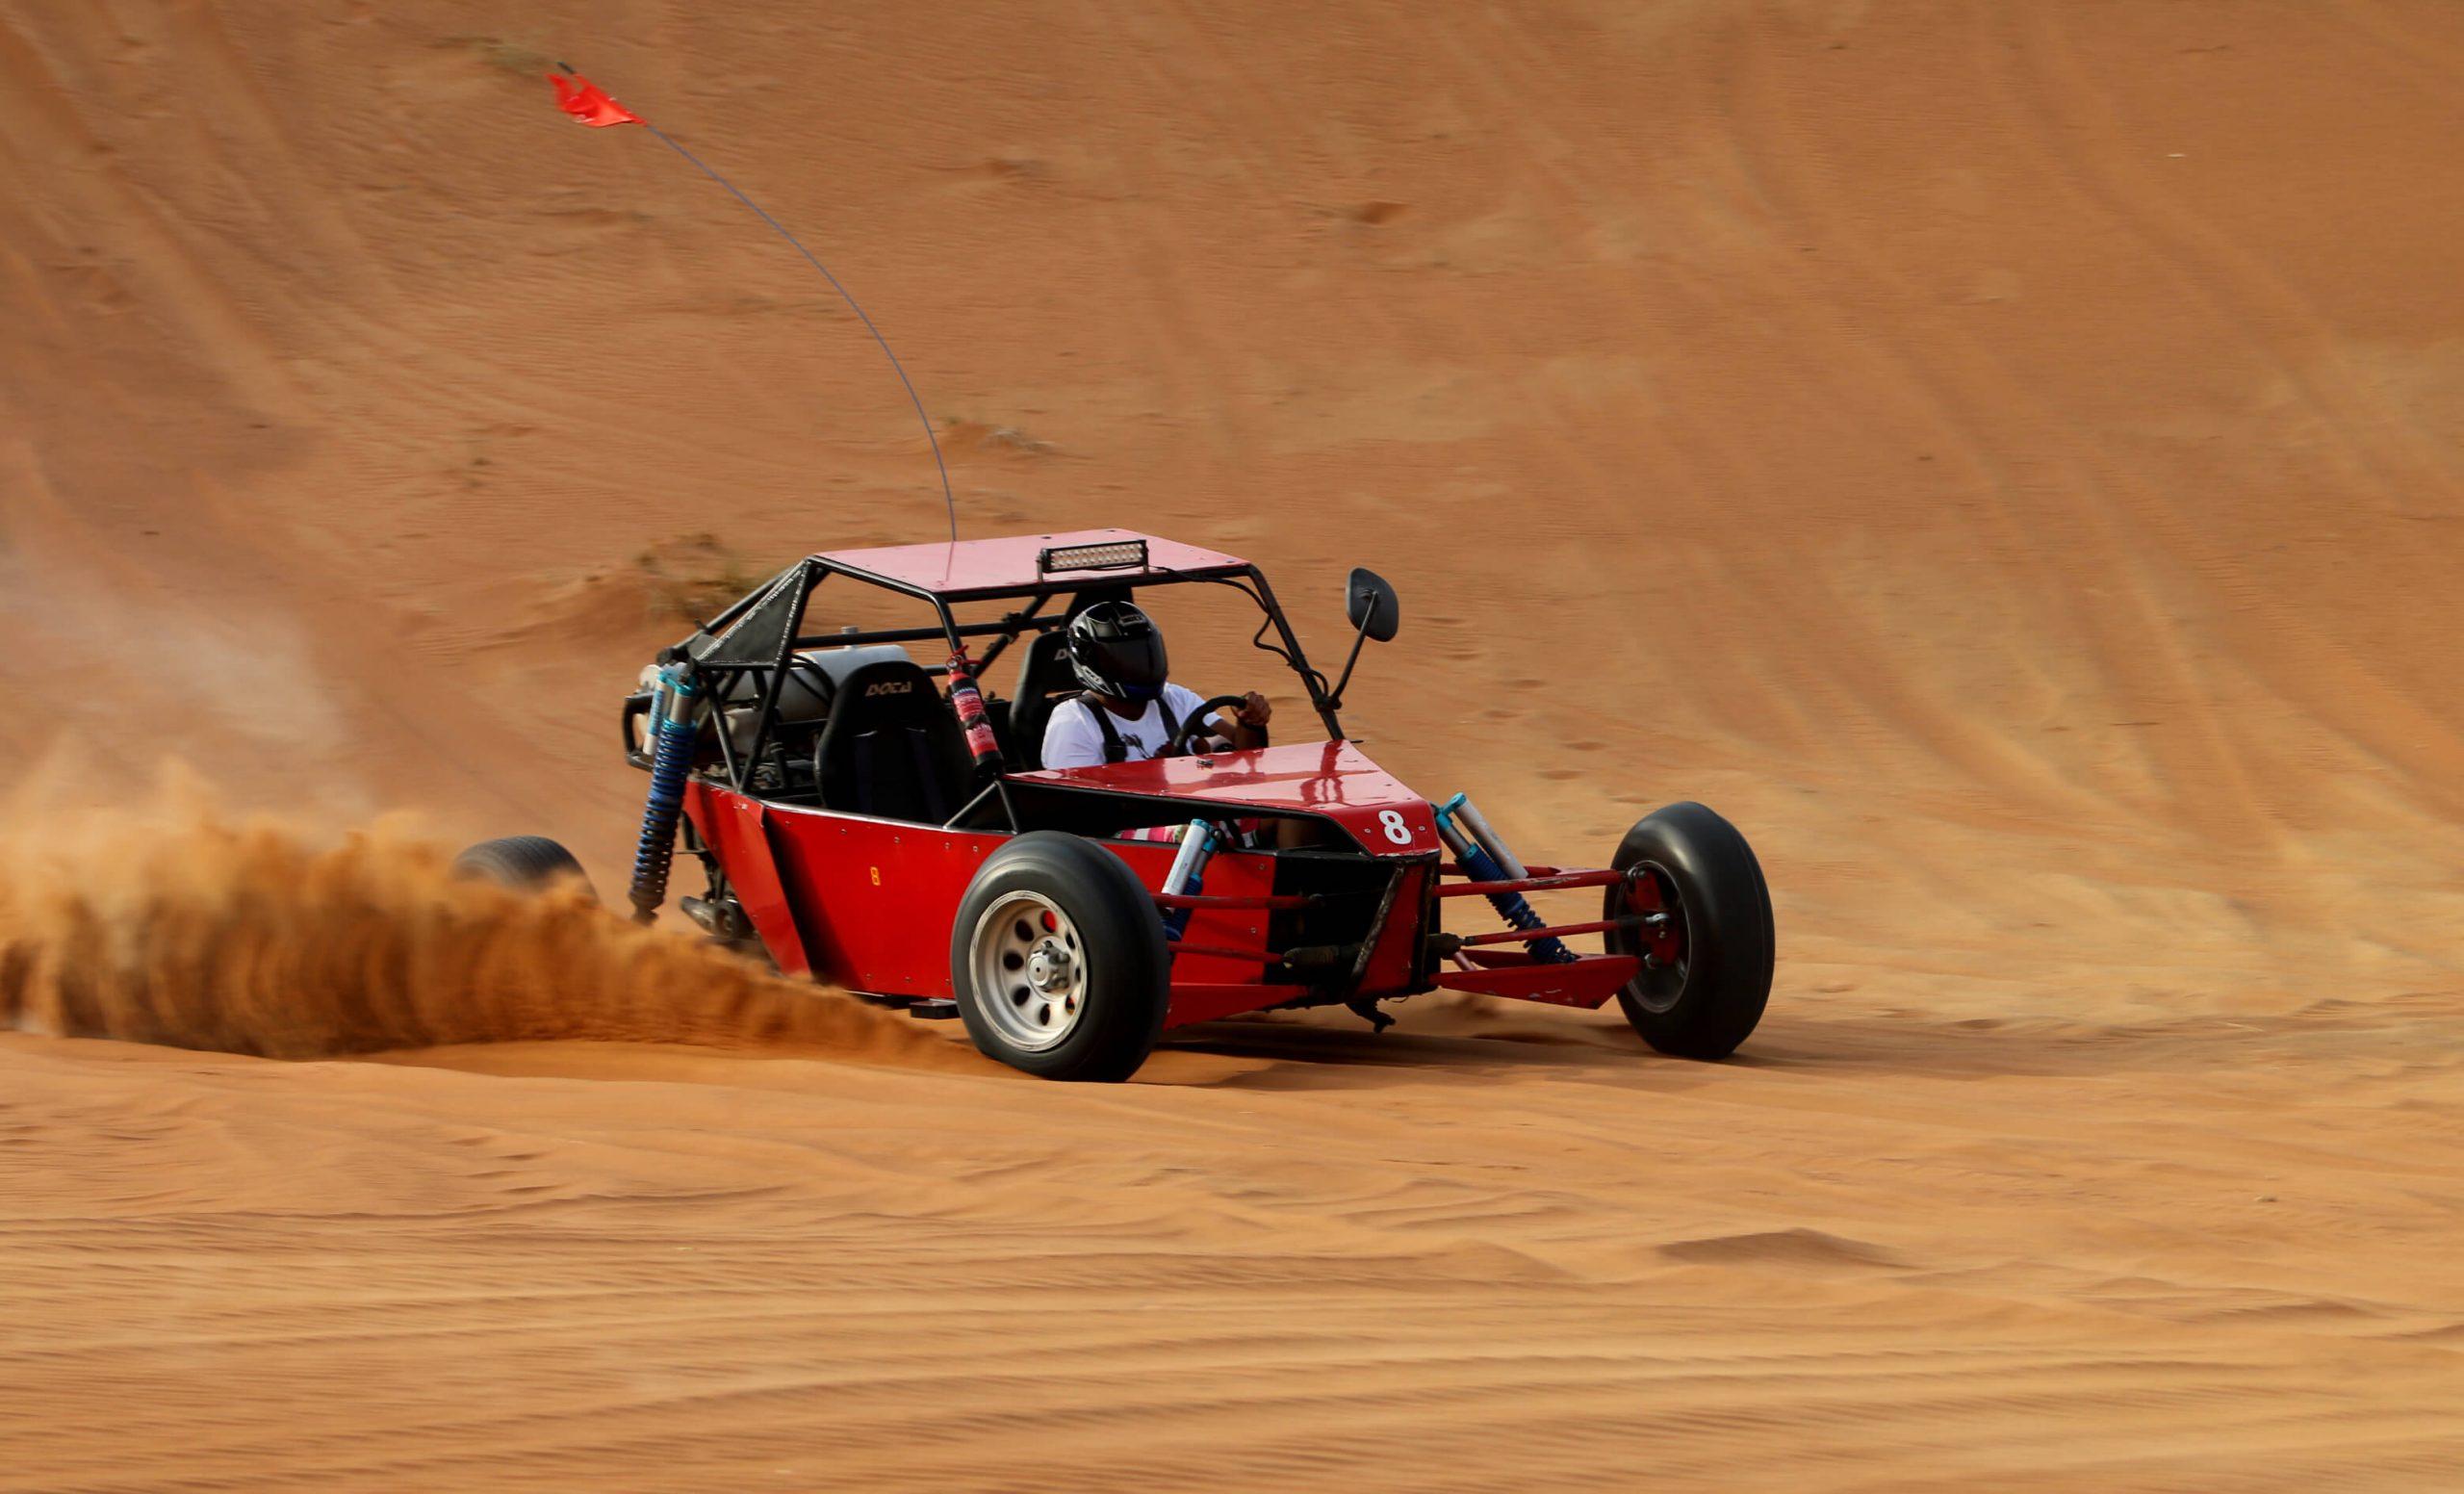 Desert Fox Dune Duggy